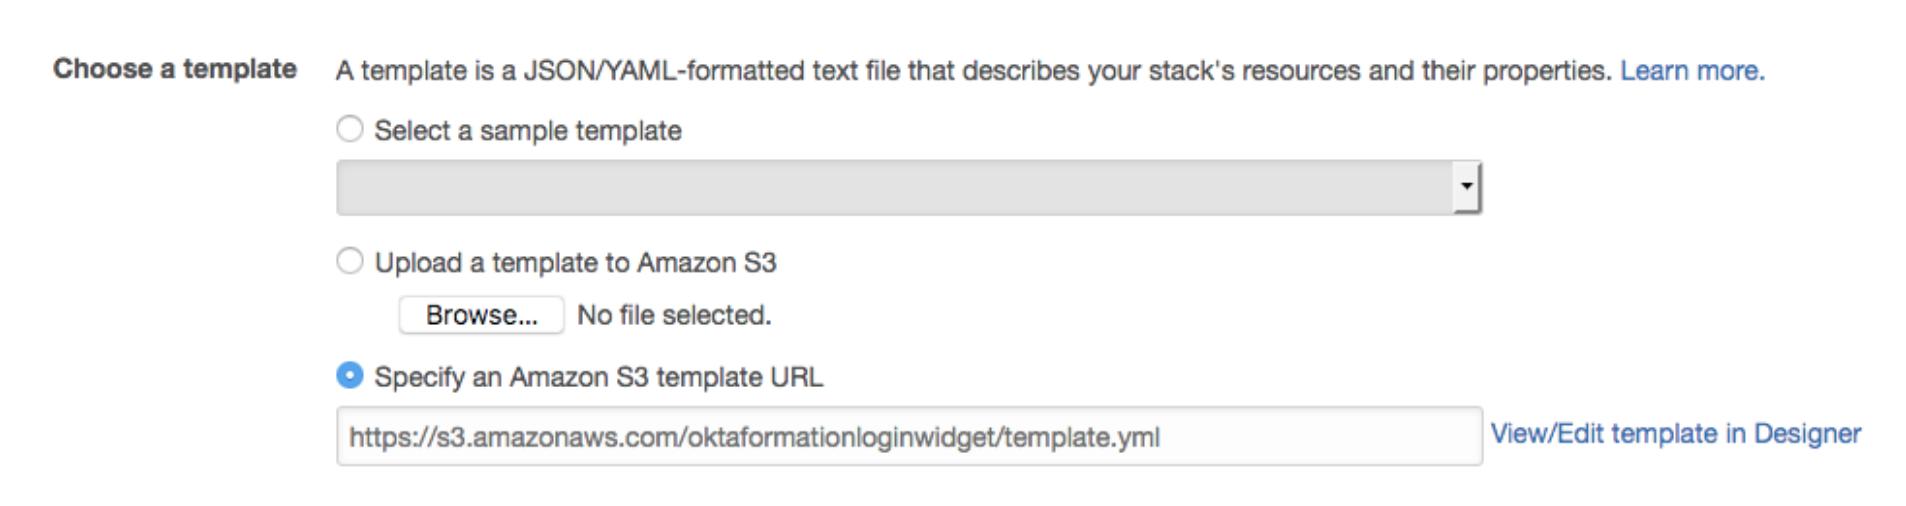 CloudFormation choose template